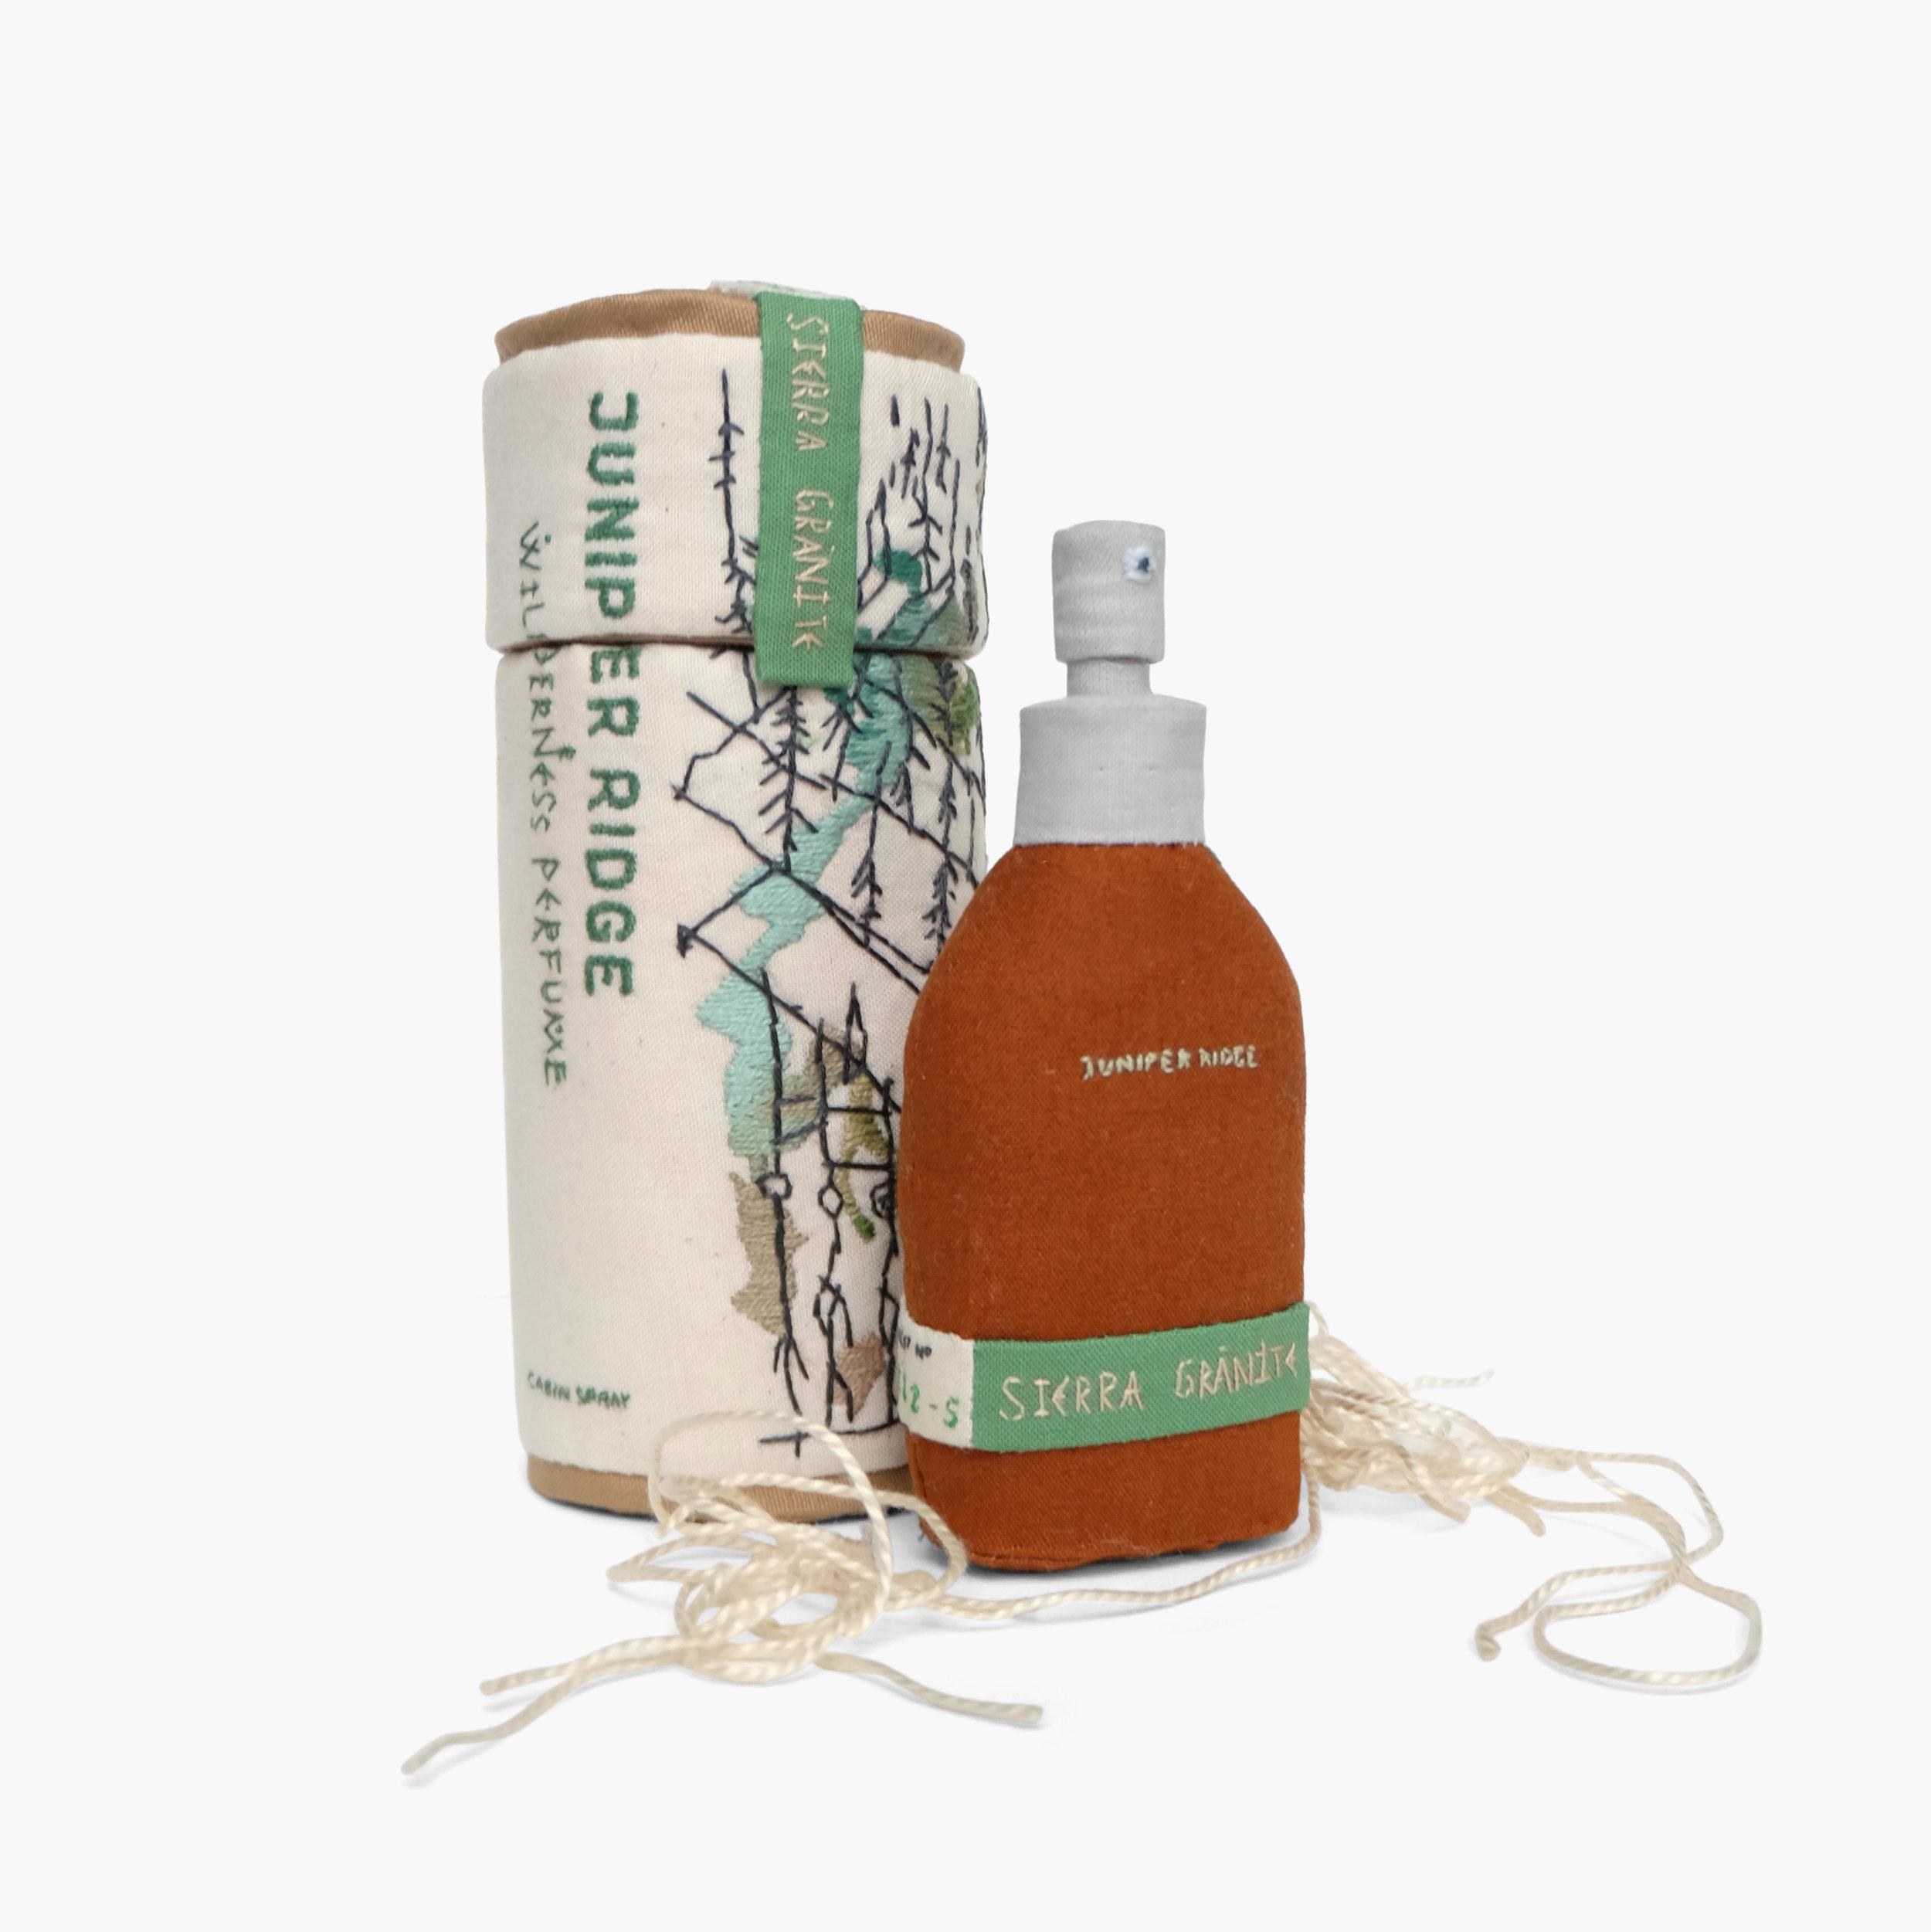 Smells Like Spirit Animal    Cabin Spray in Sierra Granite from Juniper Ridge   Fiberfill, cotton cloth, embroidery floss 6 × 2.25 × 2.25 in 2014